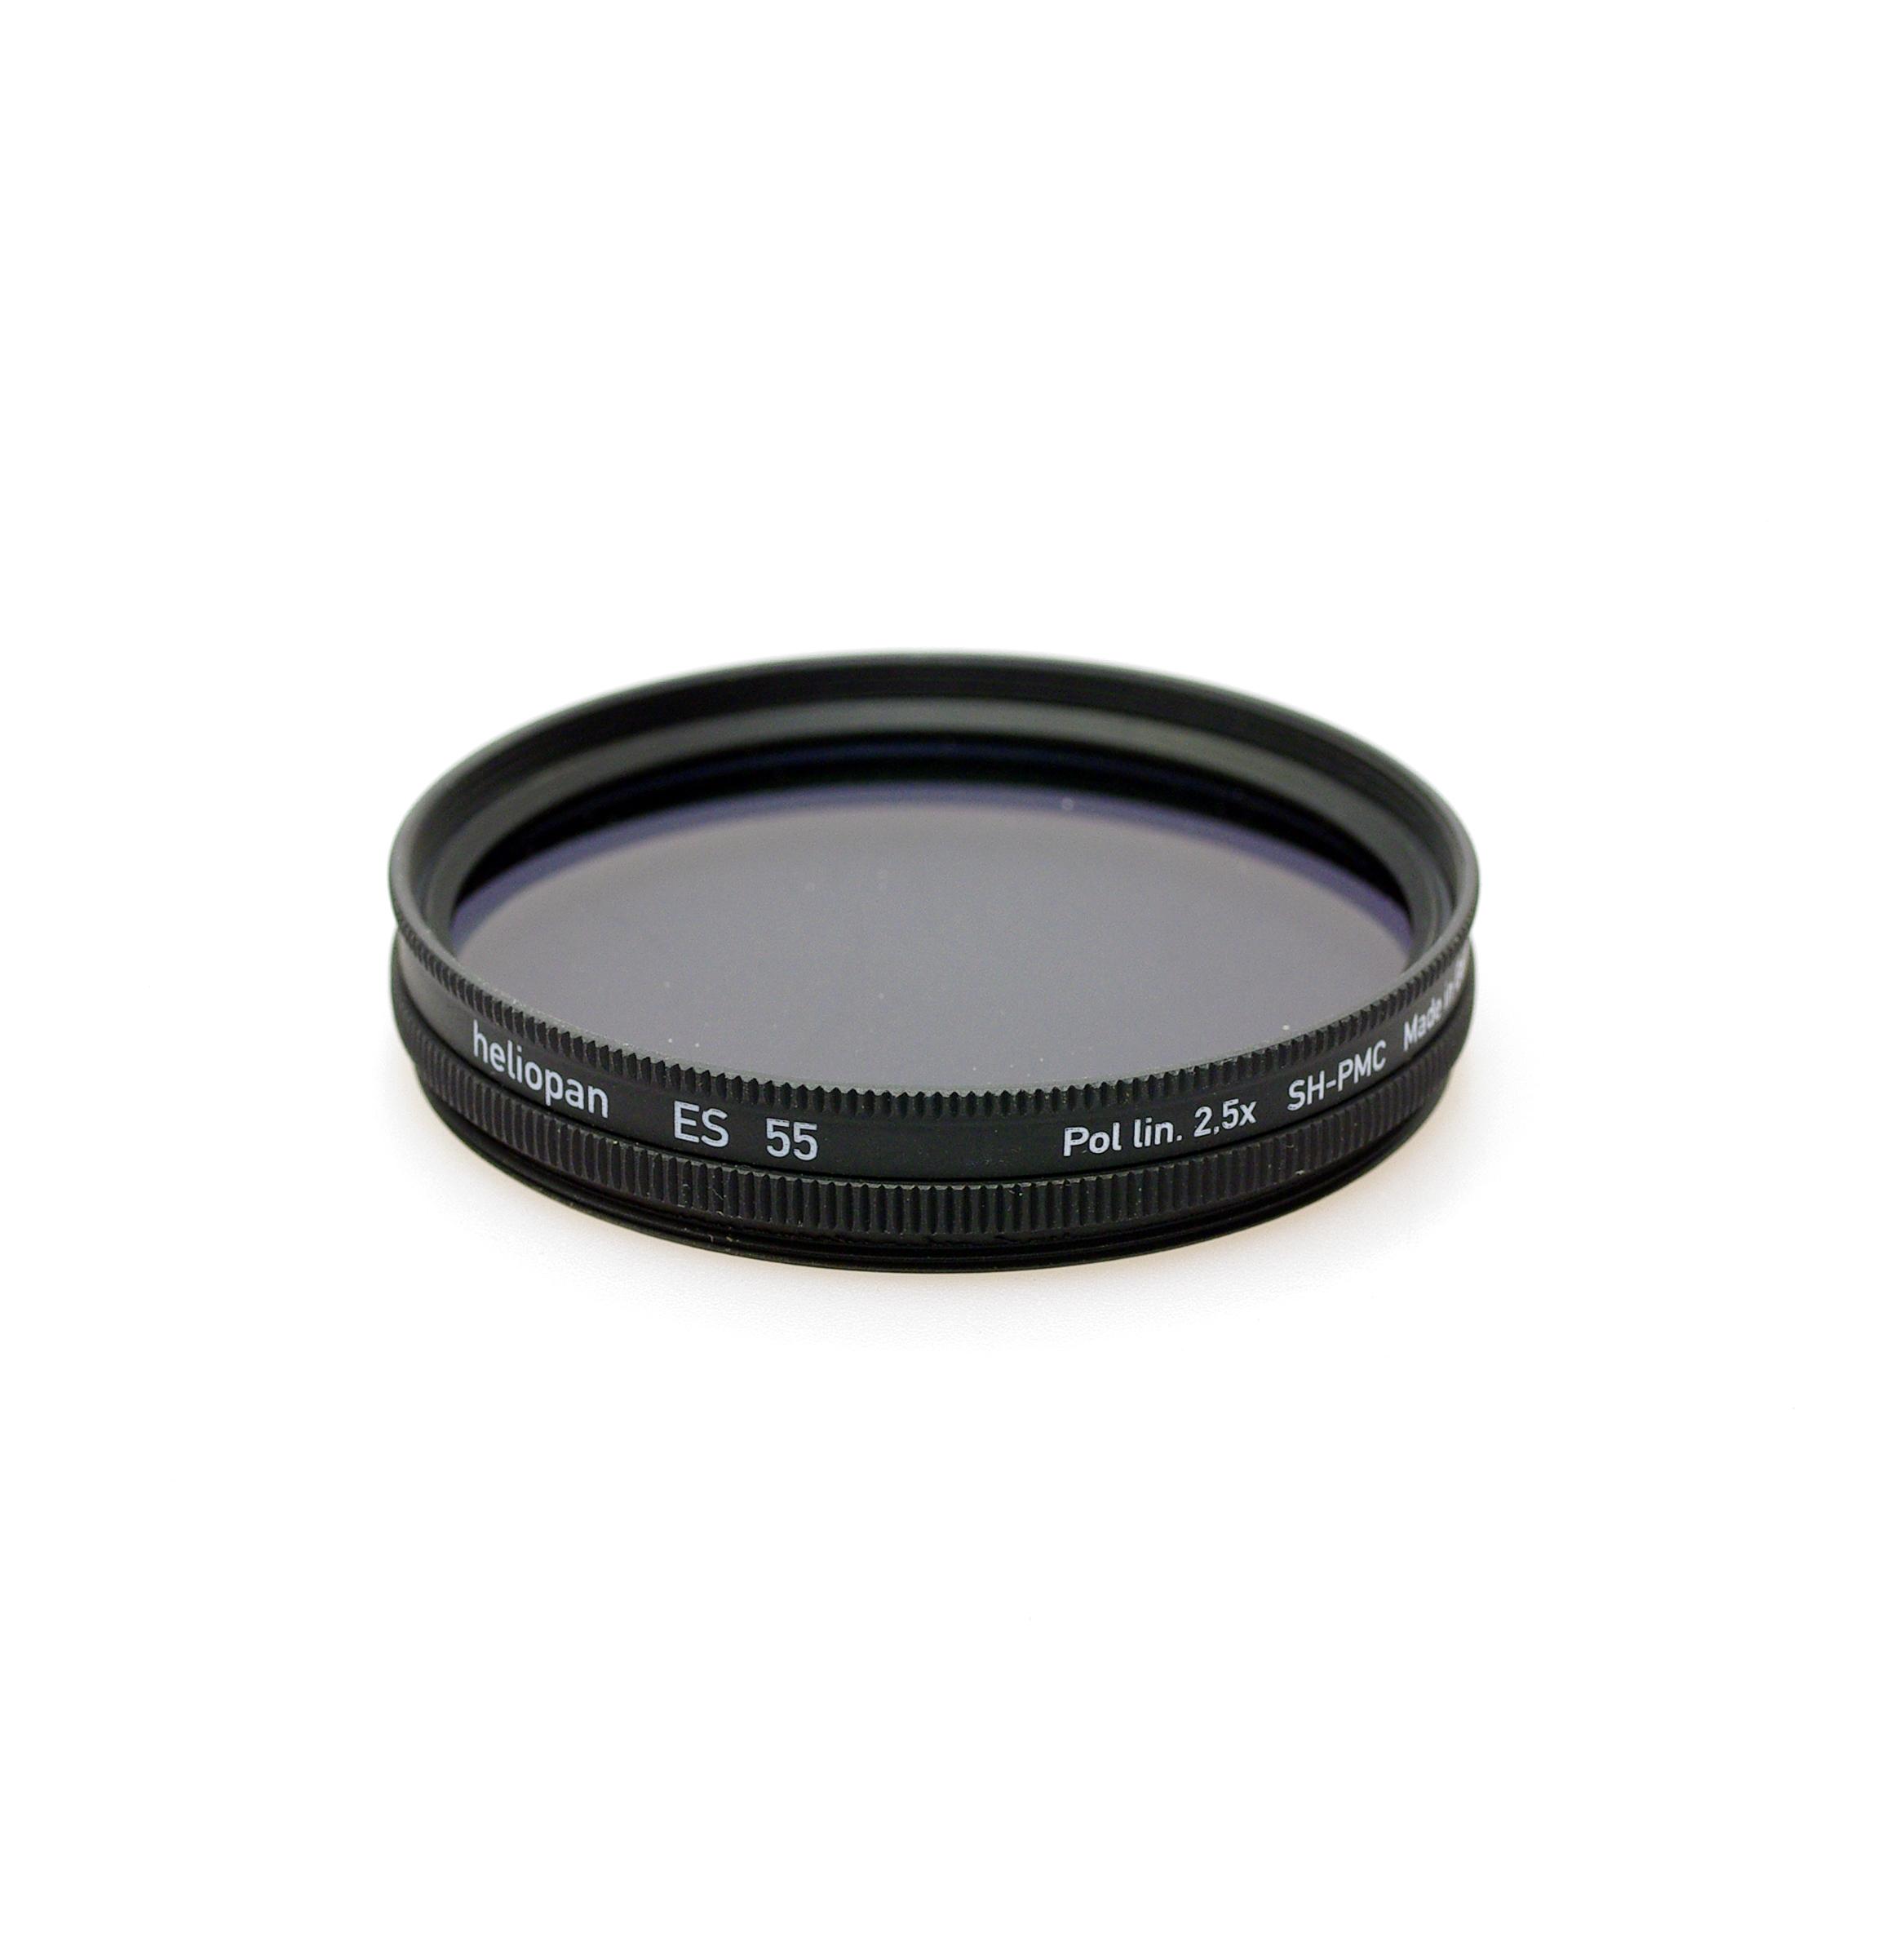 Heliopan sh-pmc (multi coated) linear polarising filter, 39-105mm